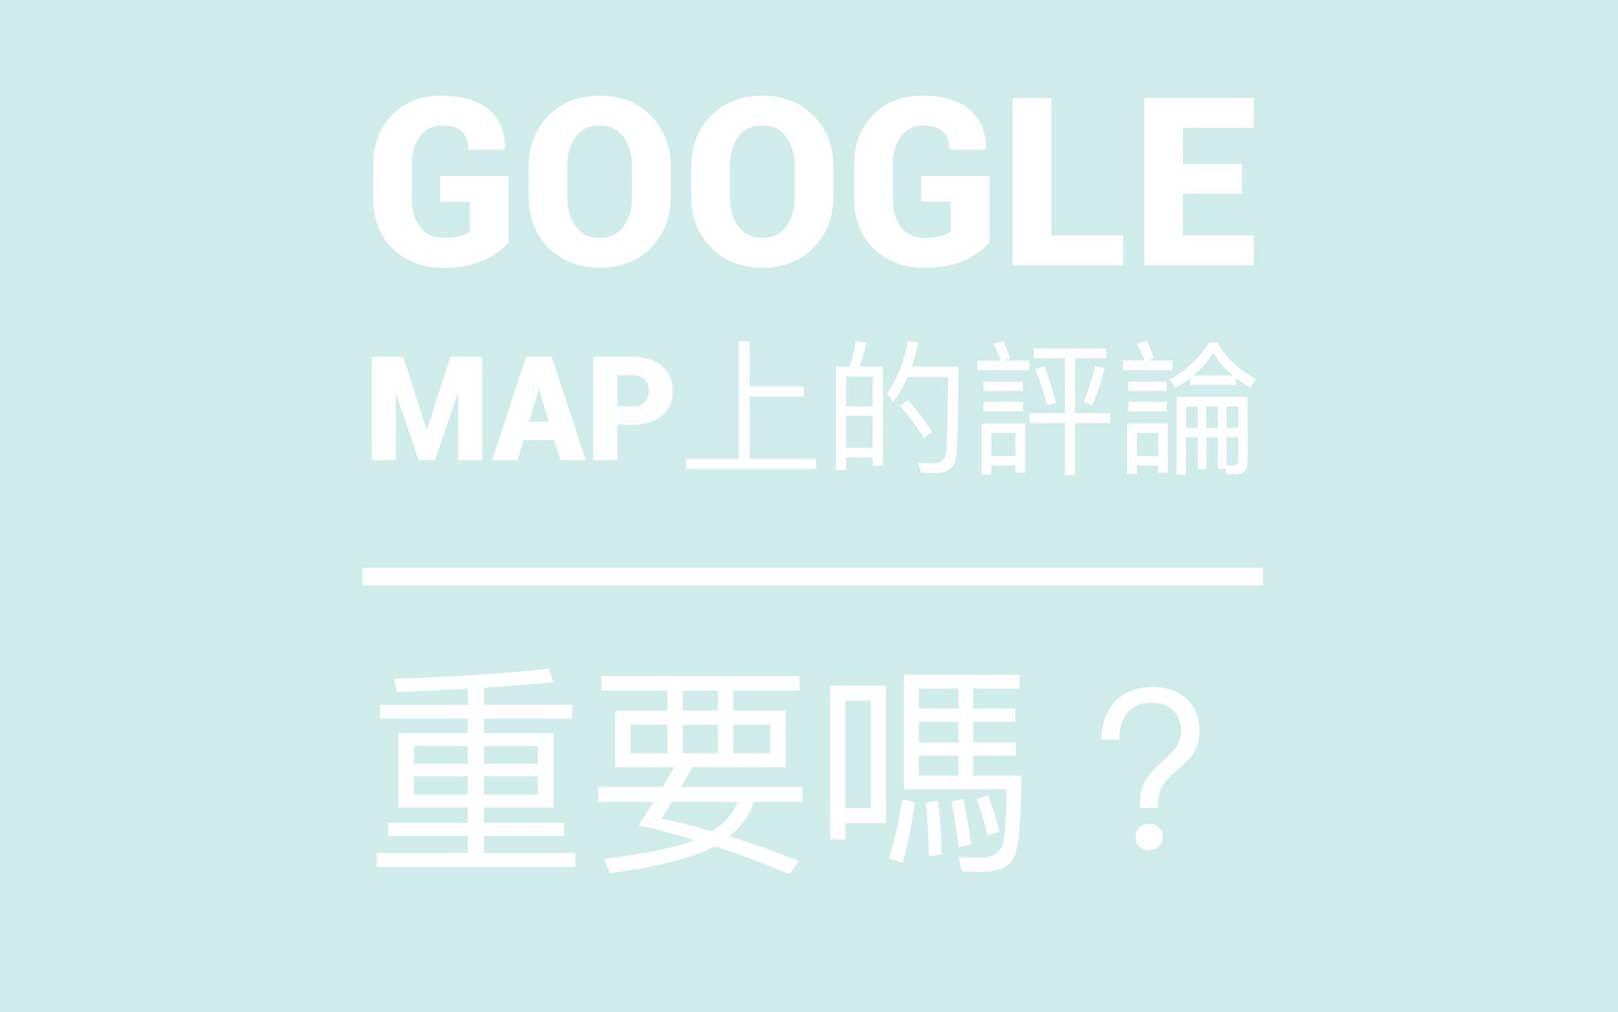 Google map上的評論是兩面刃,店家該重視Google評論上的留言嗎?消費者有不爽,Google map上直接說,對生意有影響嗎?